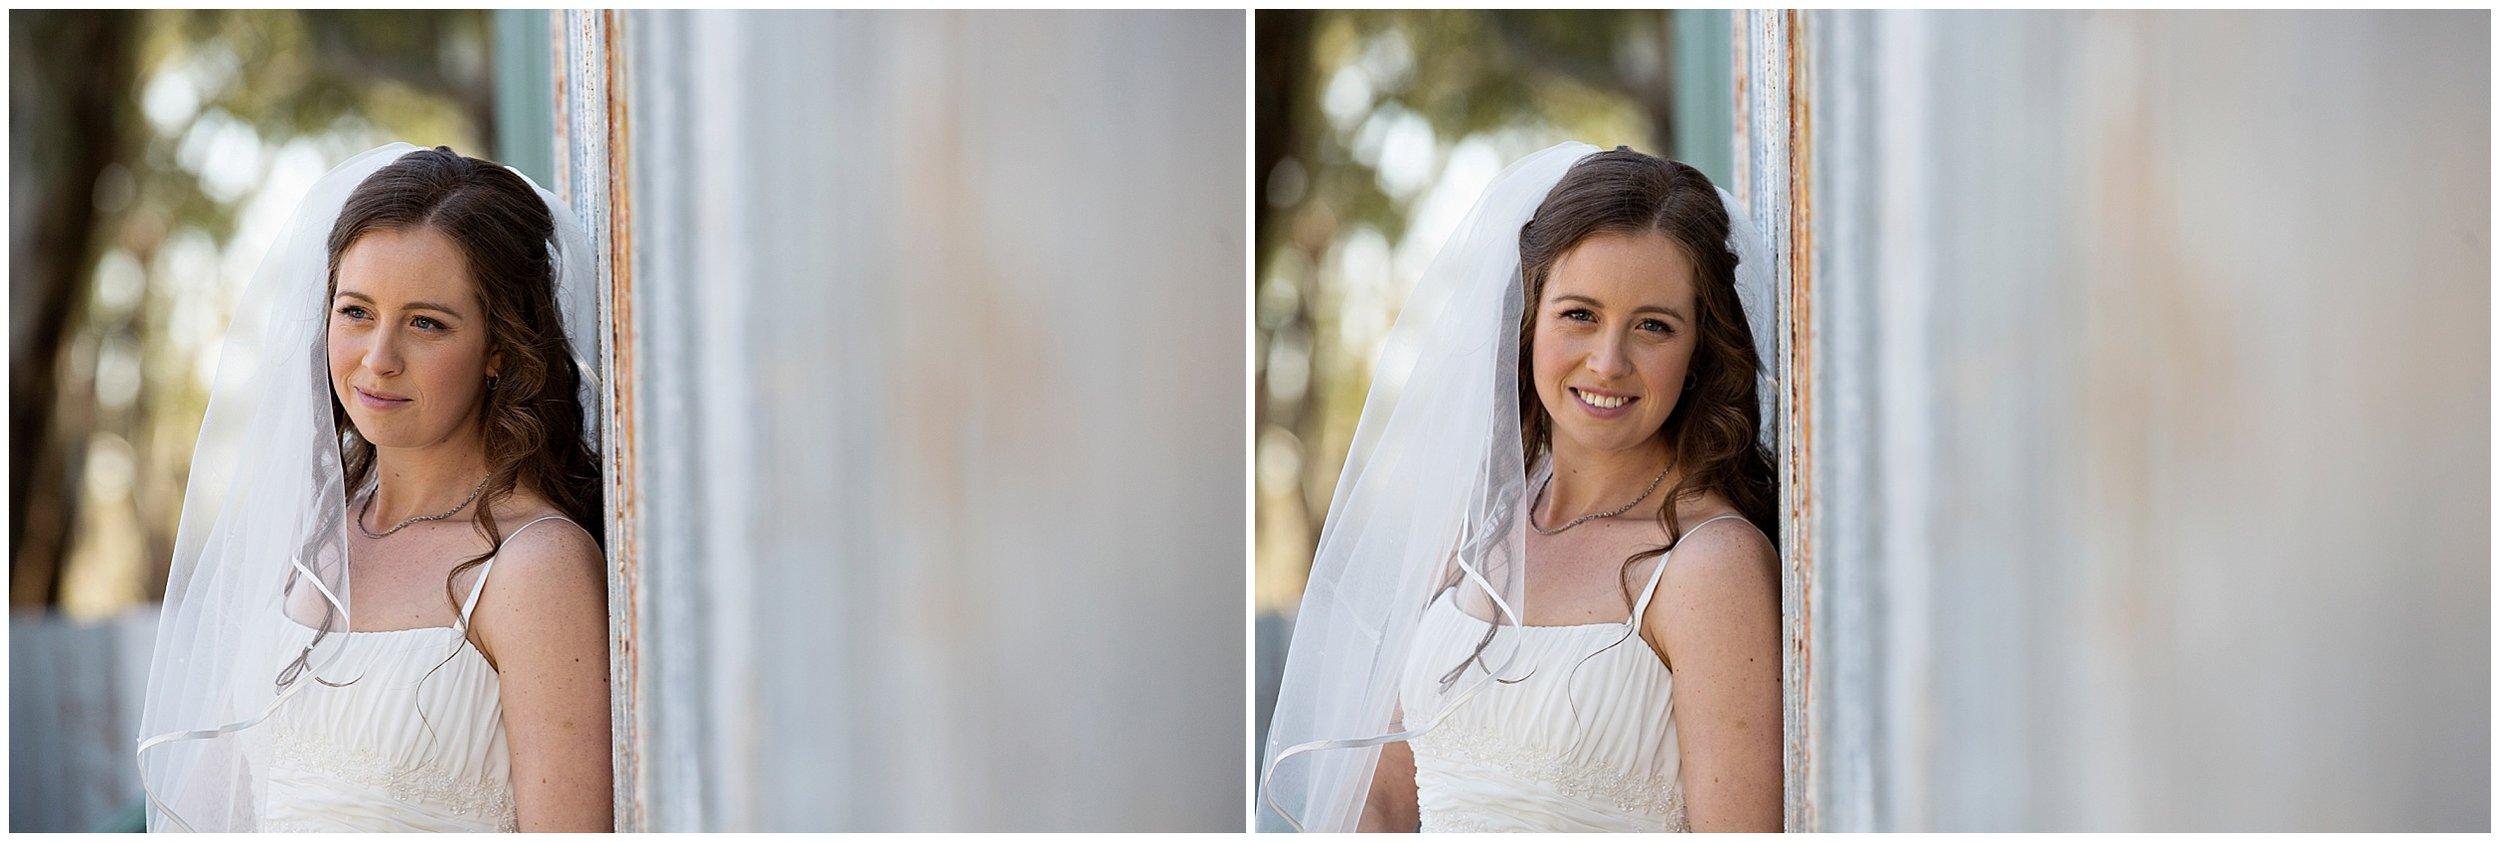 shepparton-wedding-photographer_0048.jpg